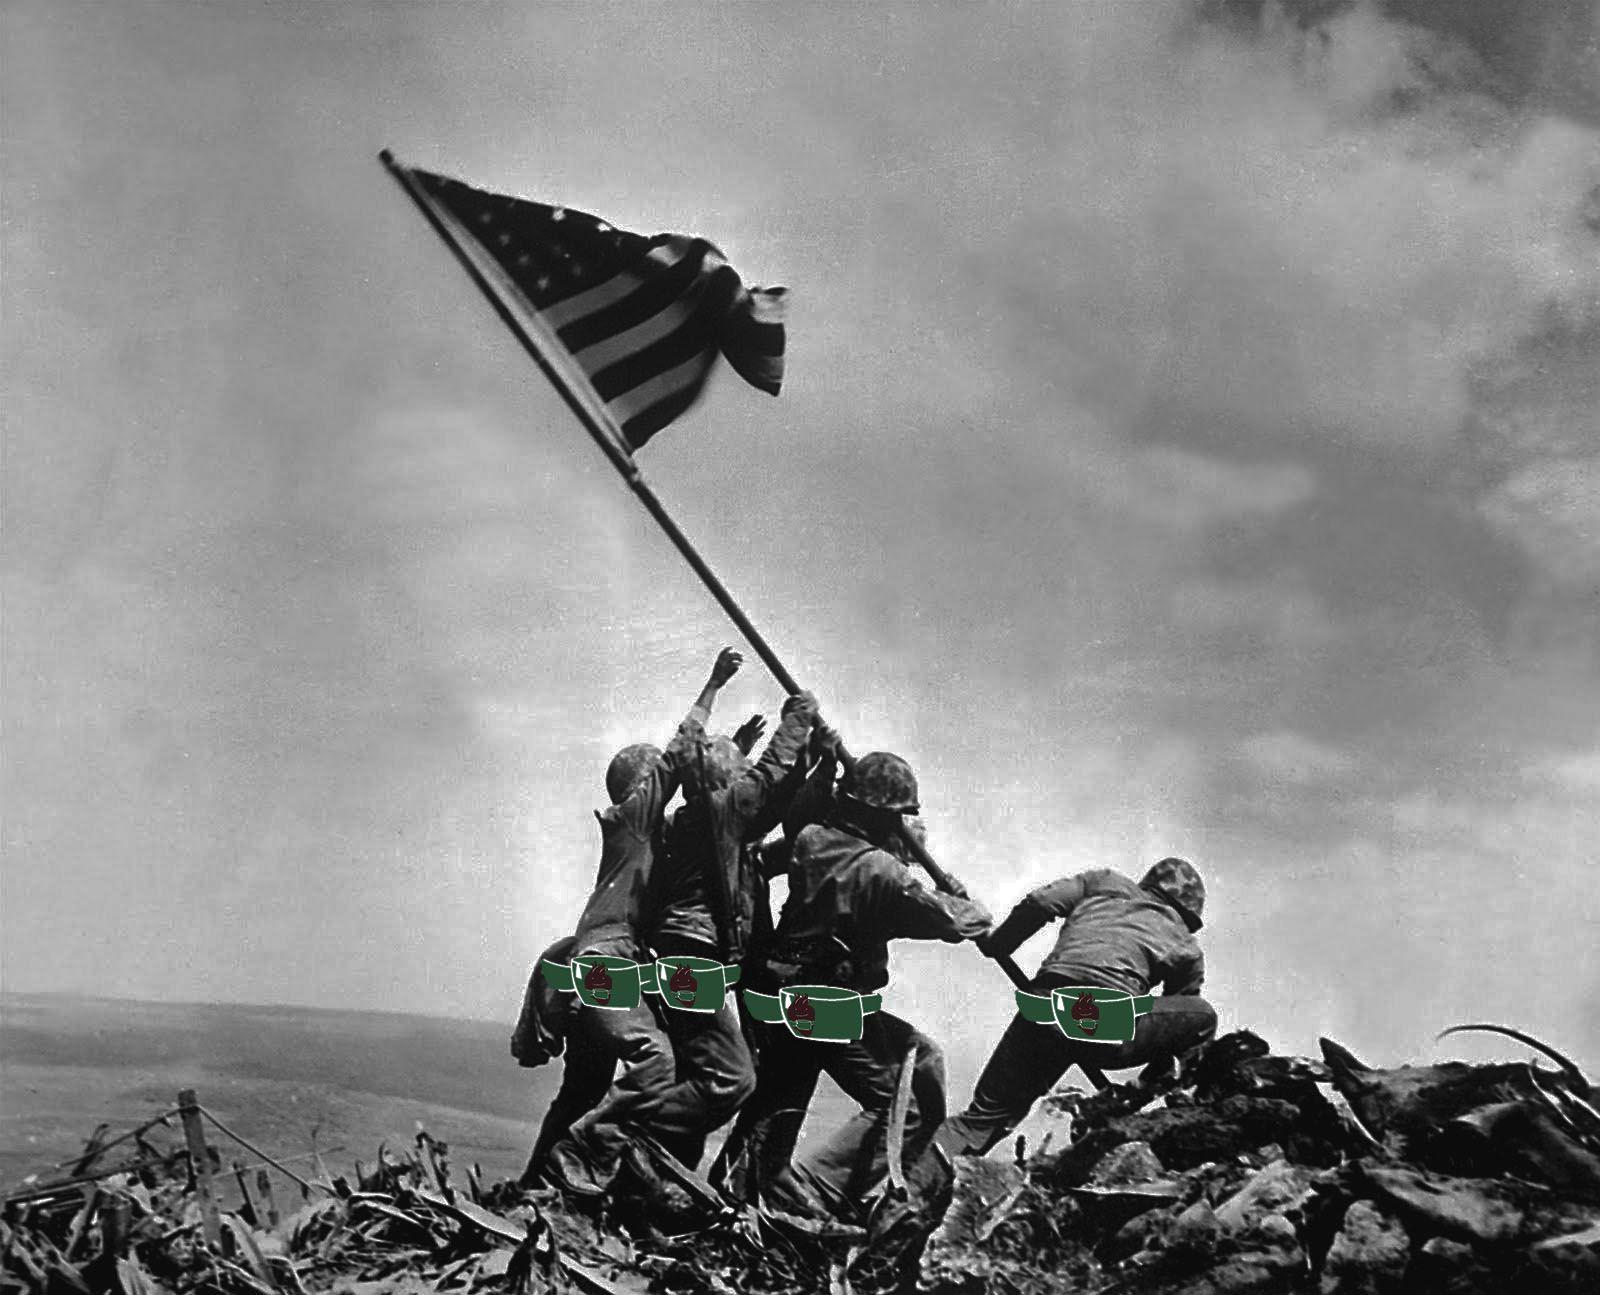 Raising The Flag Over Iwo Jima 1600 1295 Raising The Flag On Iwo Jima Wallpapers 36 Wallpapers Adorable Wallpapers Iwo Iwo Jima Wallpaper